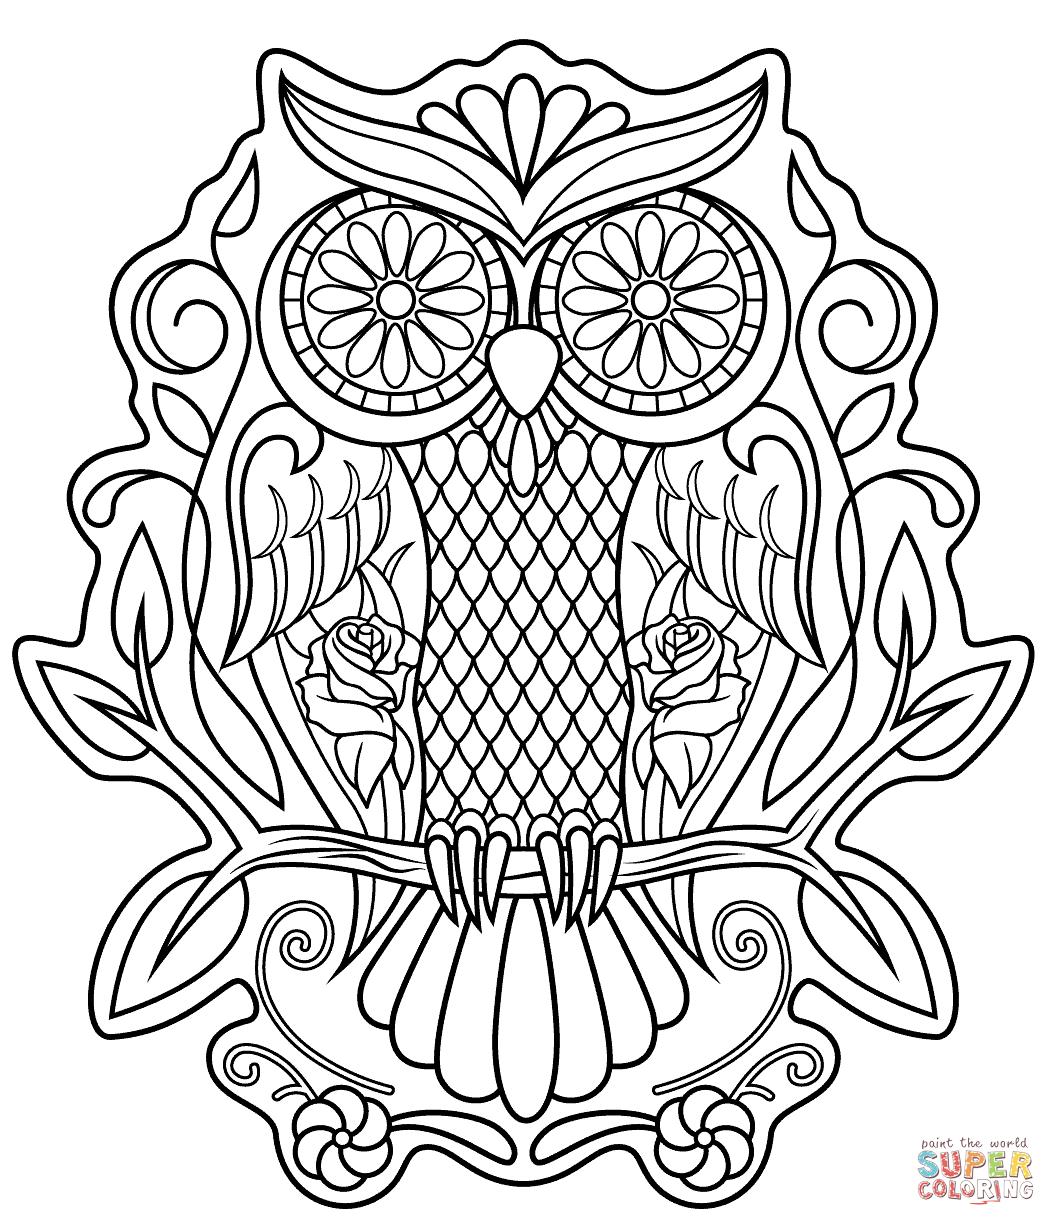 Sugar Skull Owl Coloring Page Free Printable Coloring Pages Skull Coloring Pages Owl Coloring Pages Sugar Skull Owl